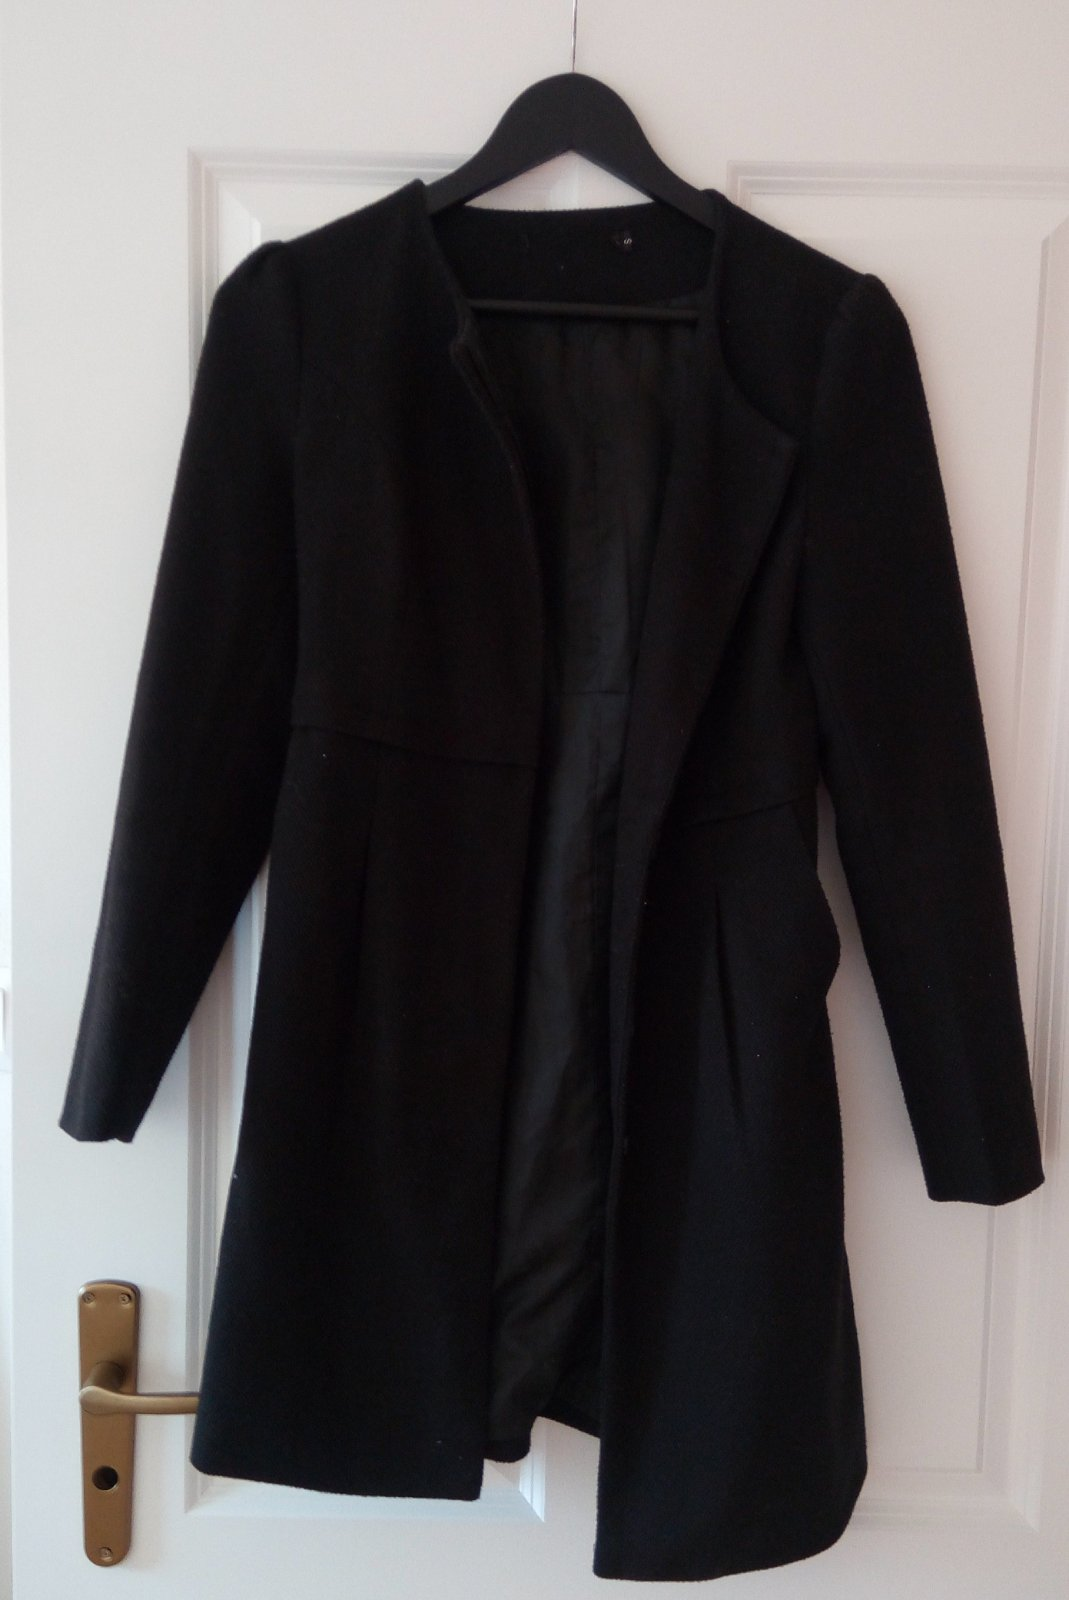 Čierny kabát/sako S - Obrázok č. 2